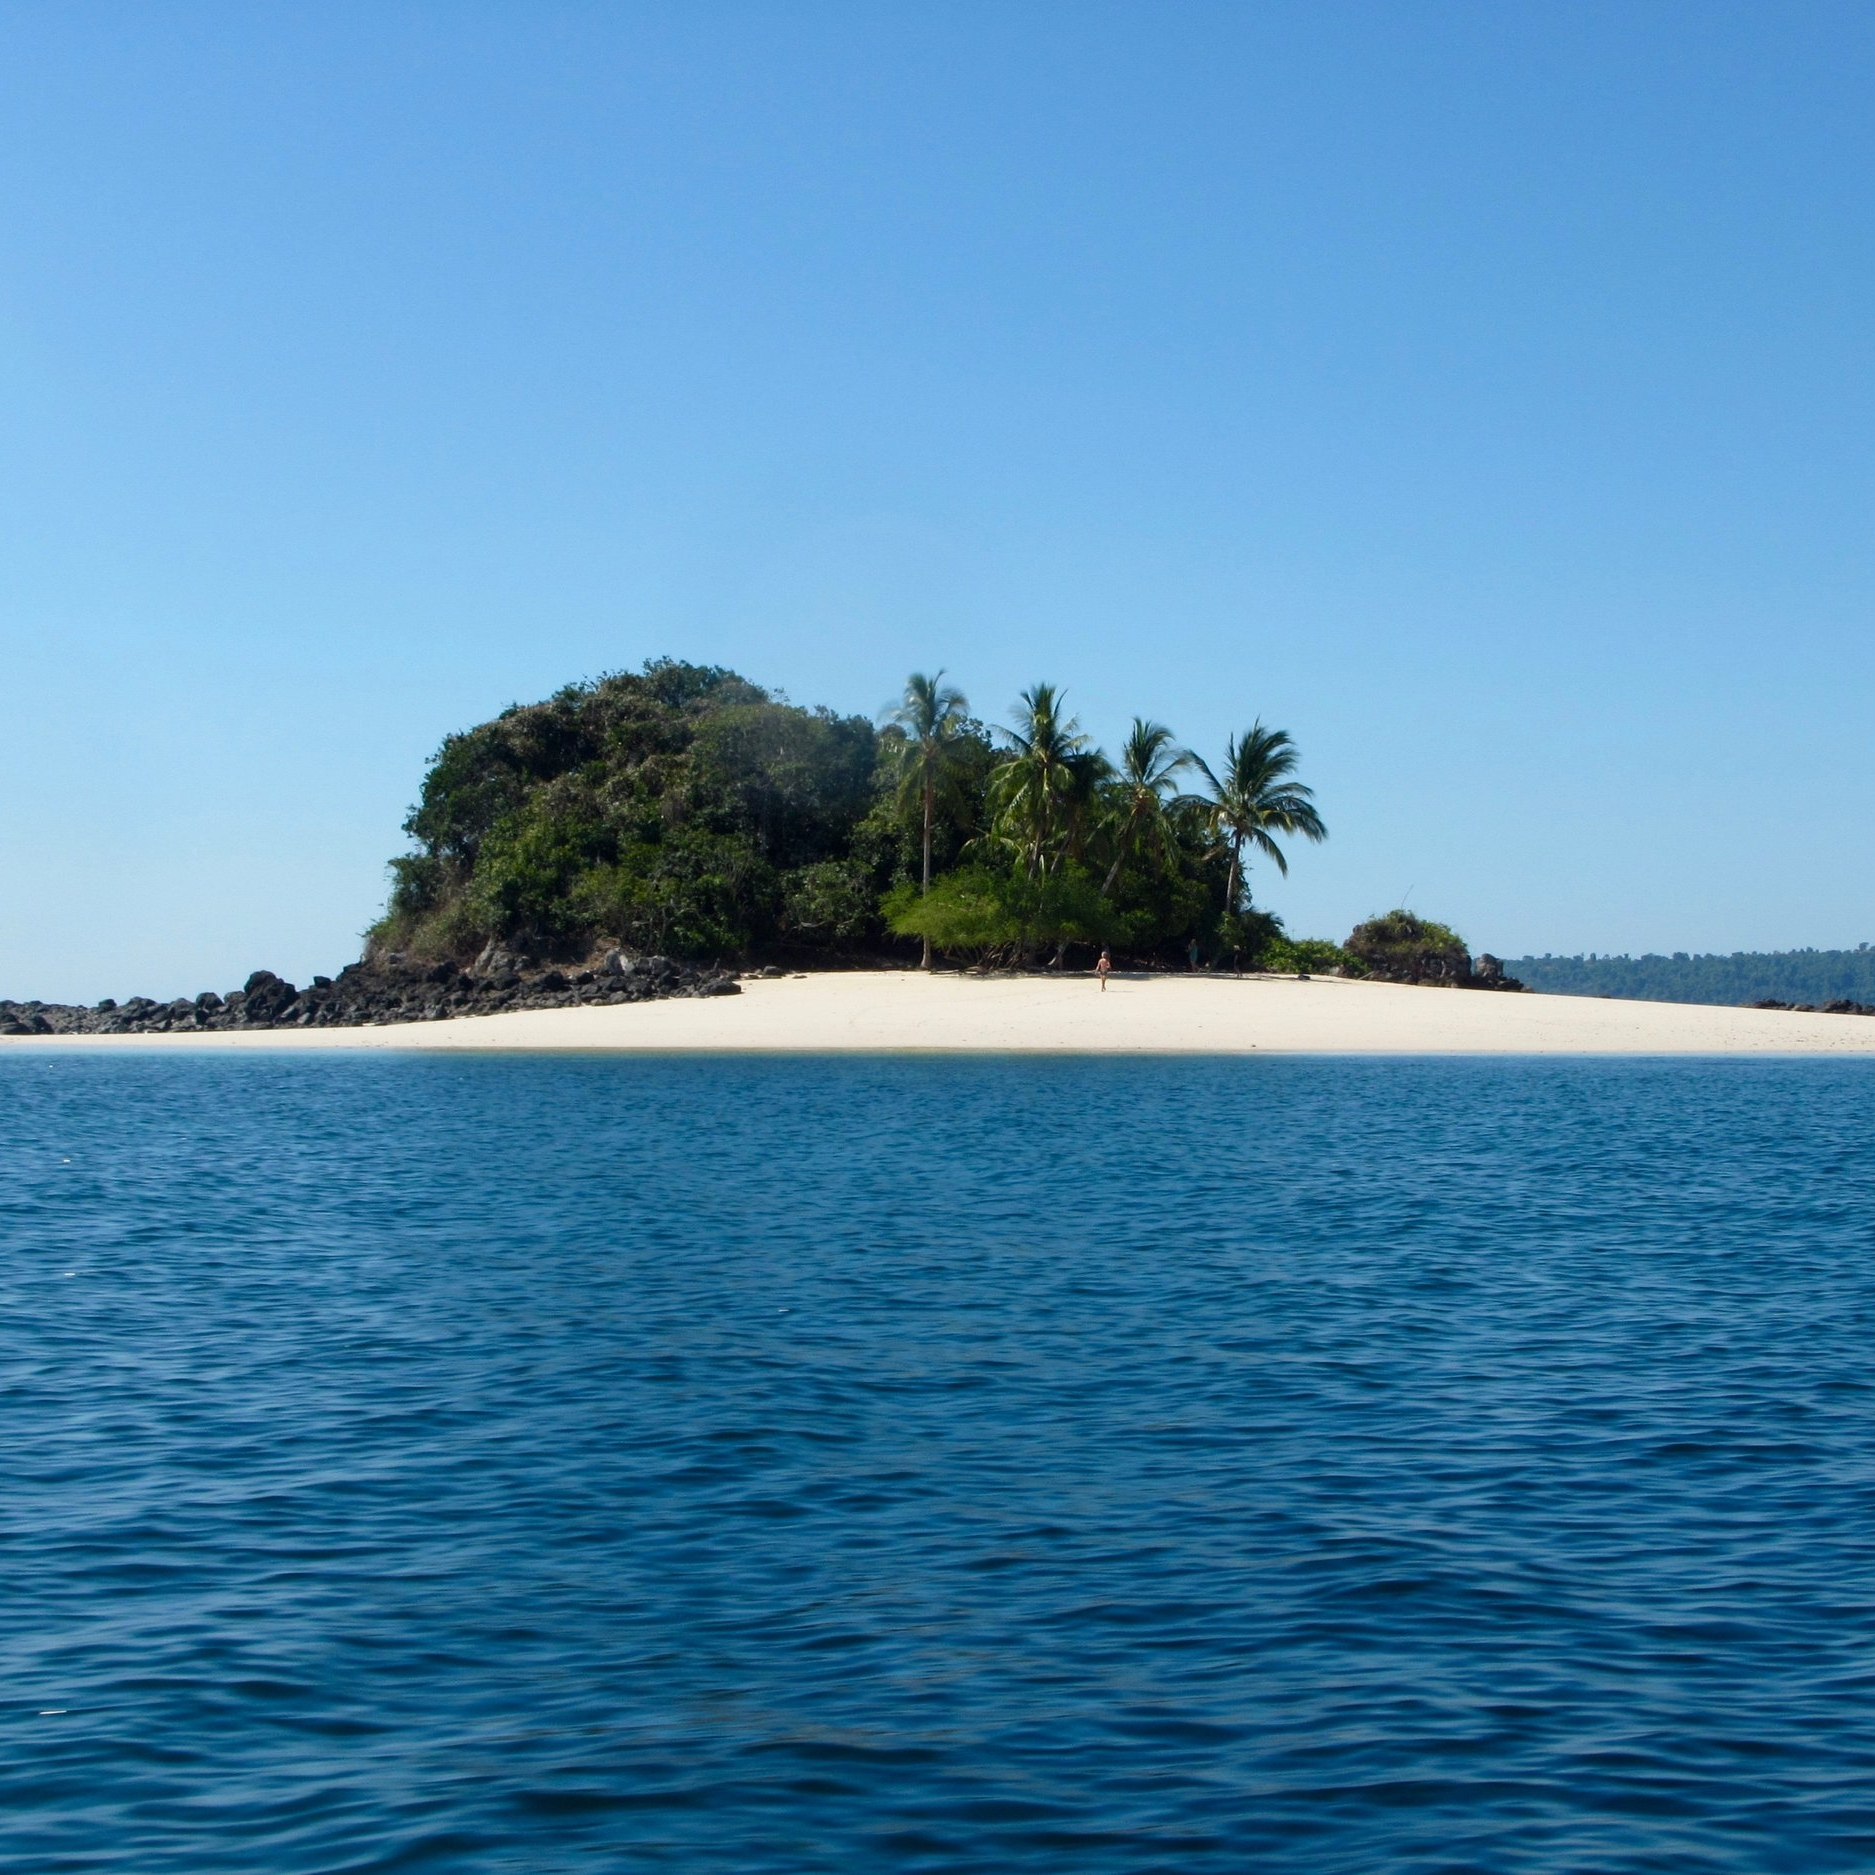 coiba-island-snorkeling-tour